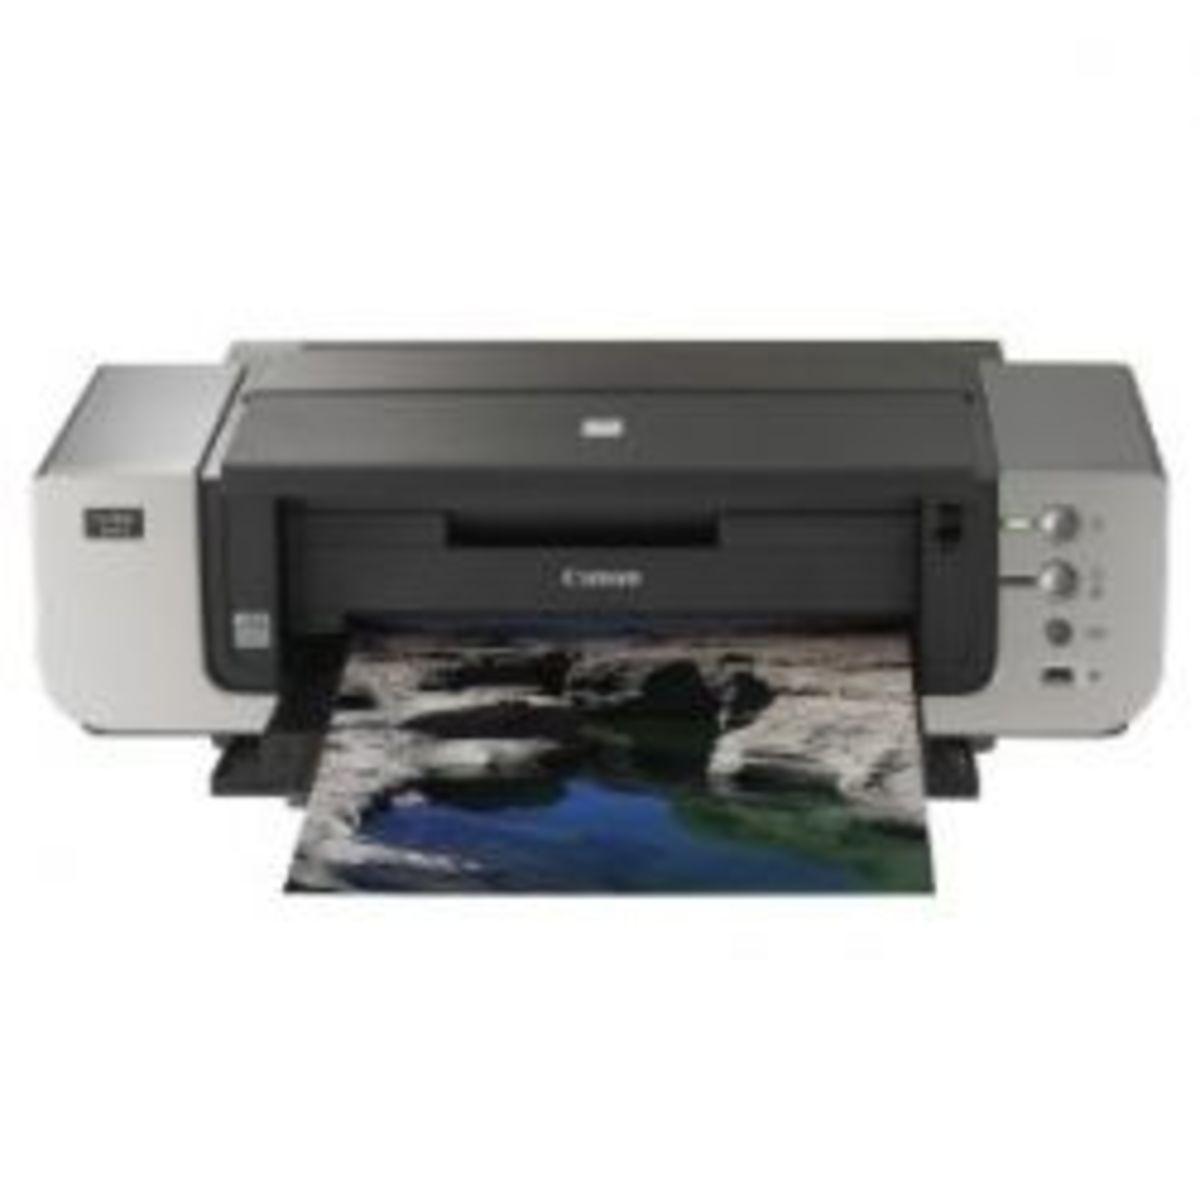 The Canon Pixma Pro 9000 Mark II Inkjet Printer